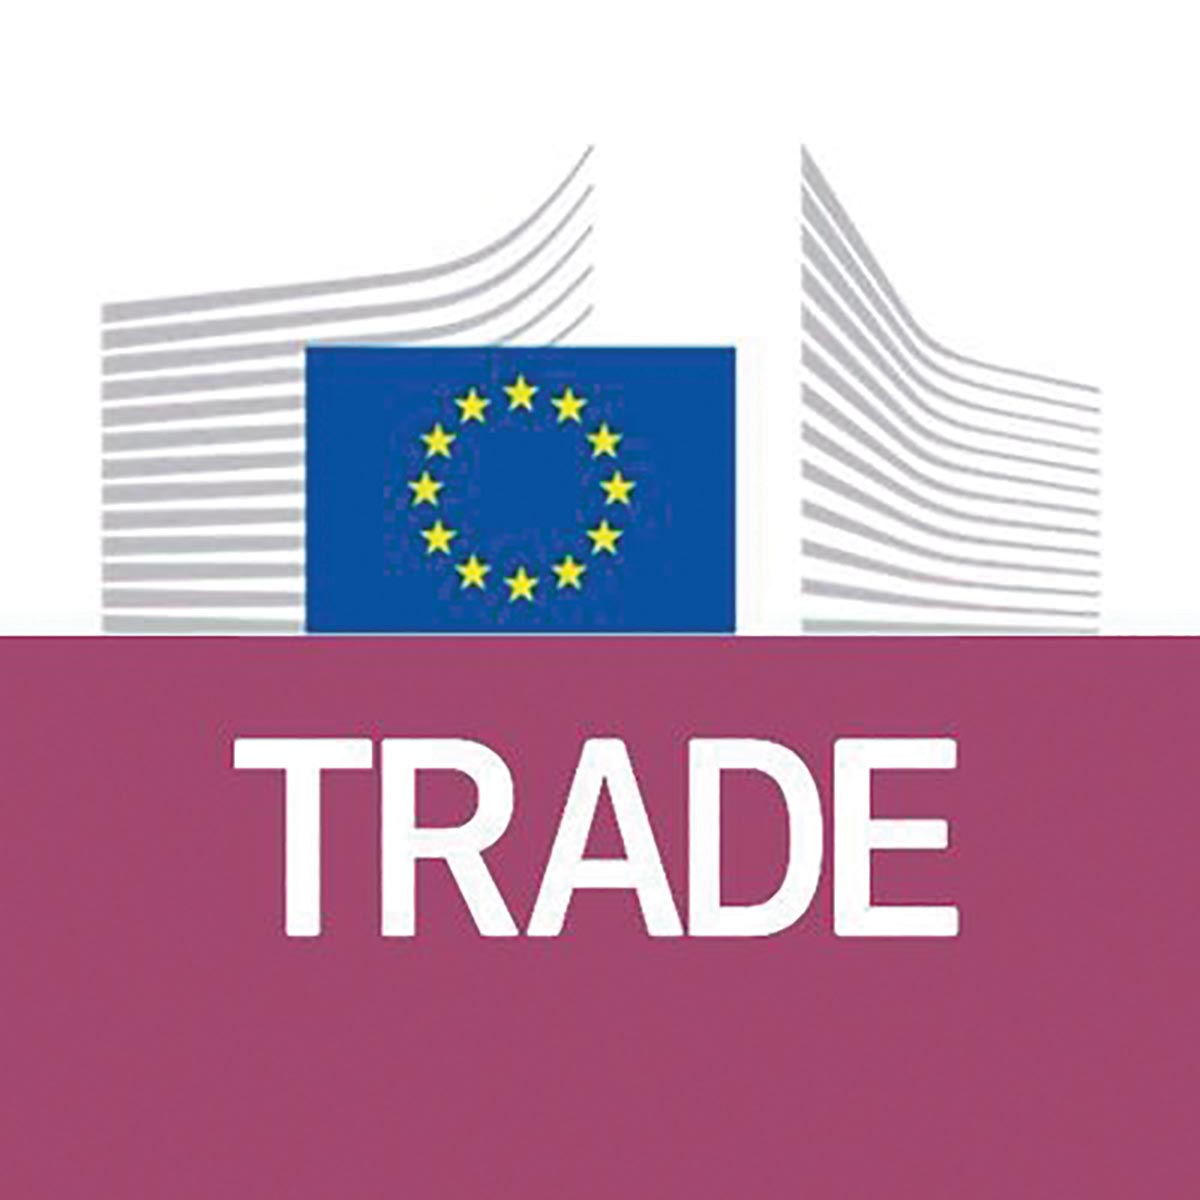 Six-Month Suspension of EU/U.S. Tariffs Proposed